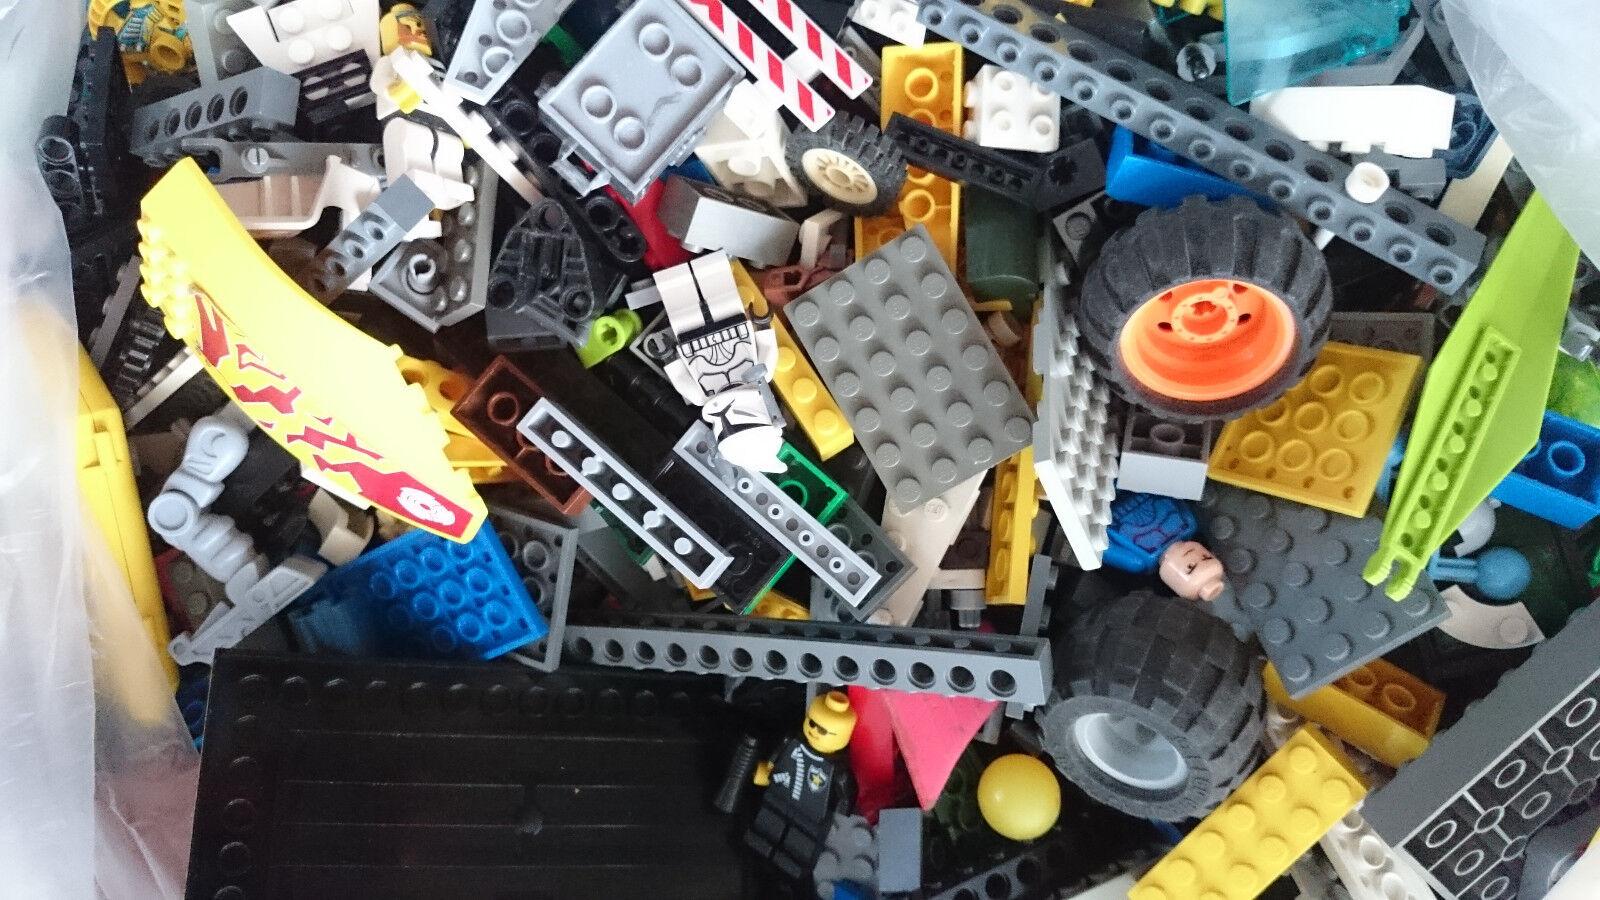 2kg LEGO Konvolut ca.1450 Teile LEGO Kiloware,Stein, Platten, Räder, Sonderteile